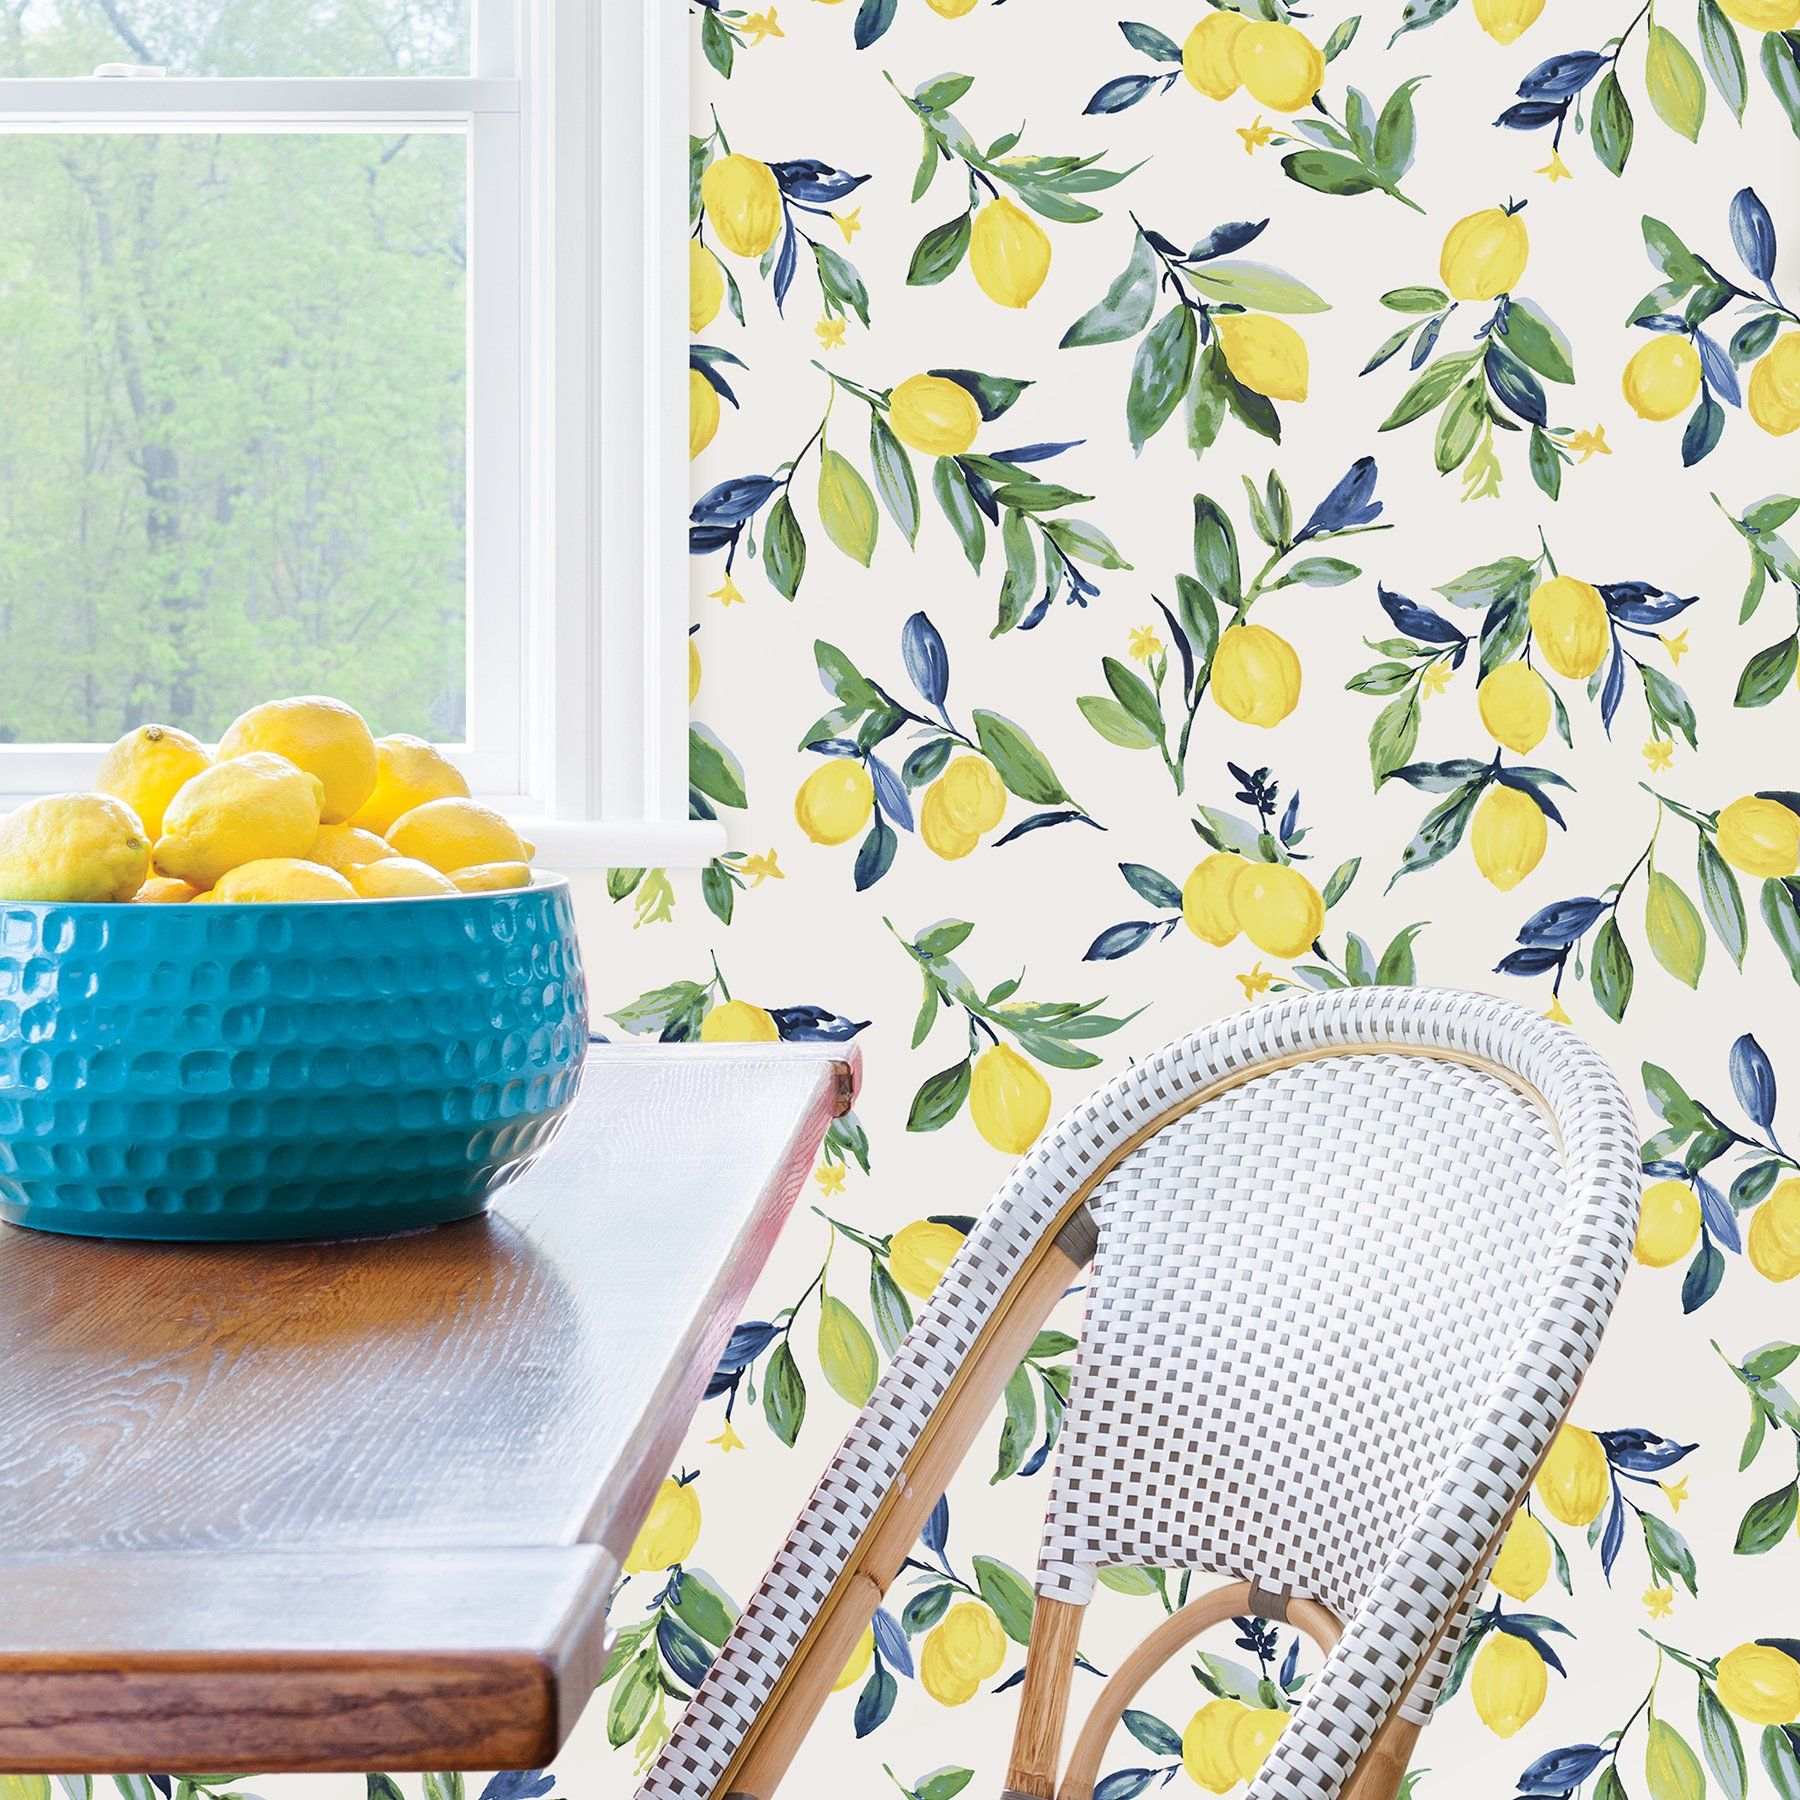 Nuwallpaper Lemon Drop Yellow Peel Stick Wallpaper Walmart Com Peel And Stick Wallpaper Nuwallpaper Peelable Wallpaper